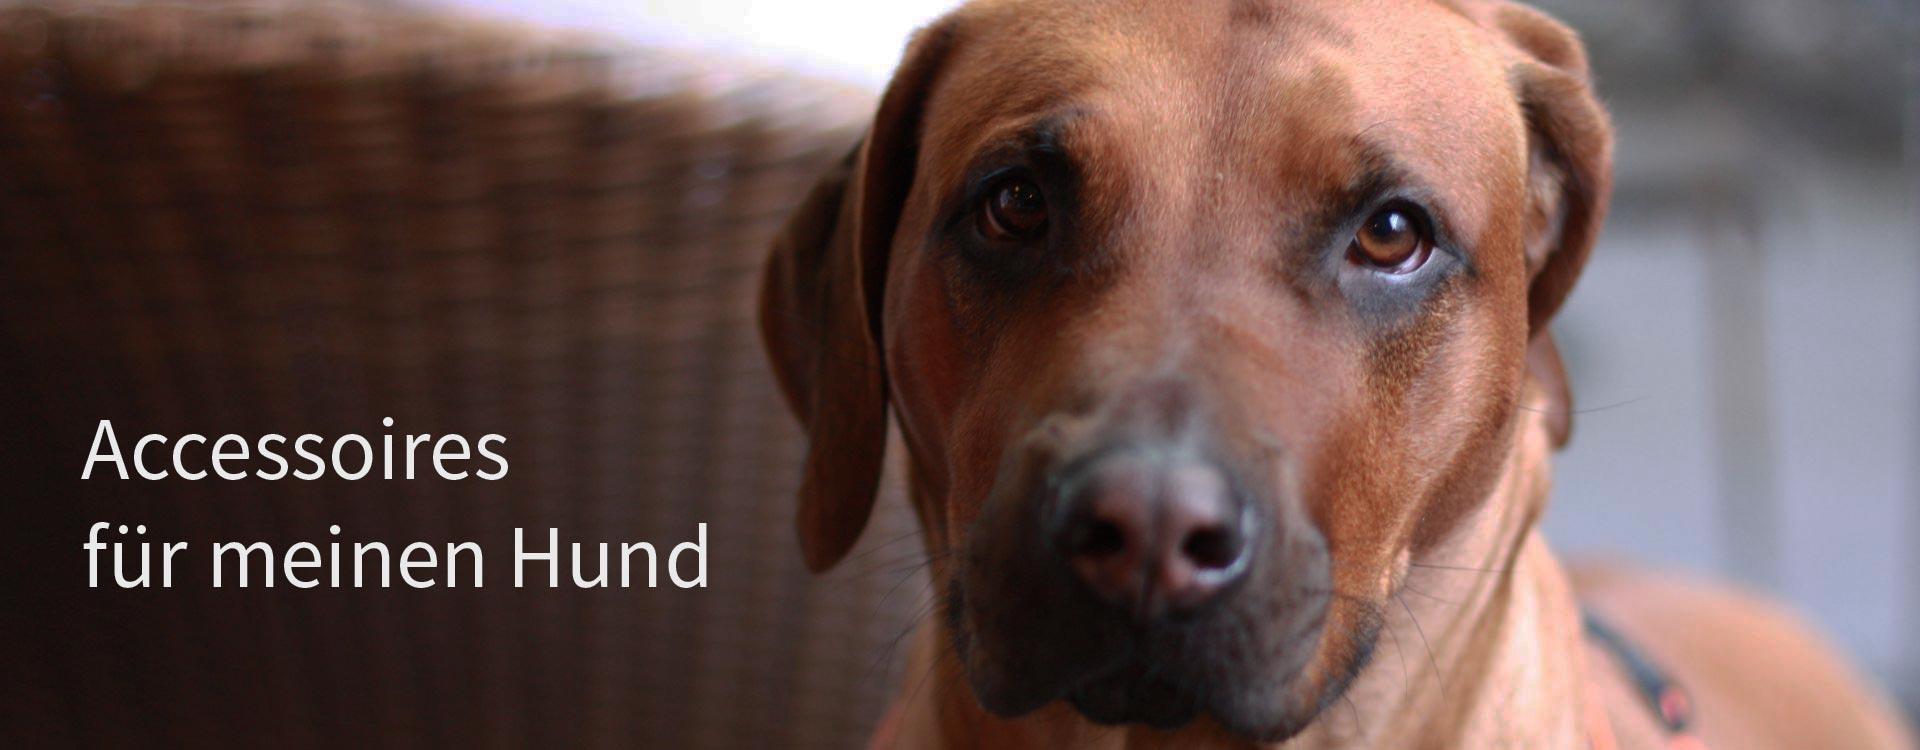 Lederband für Hunde